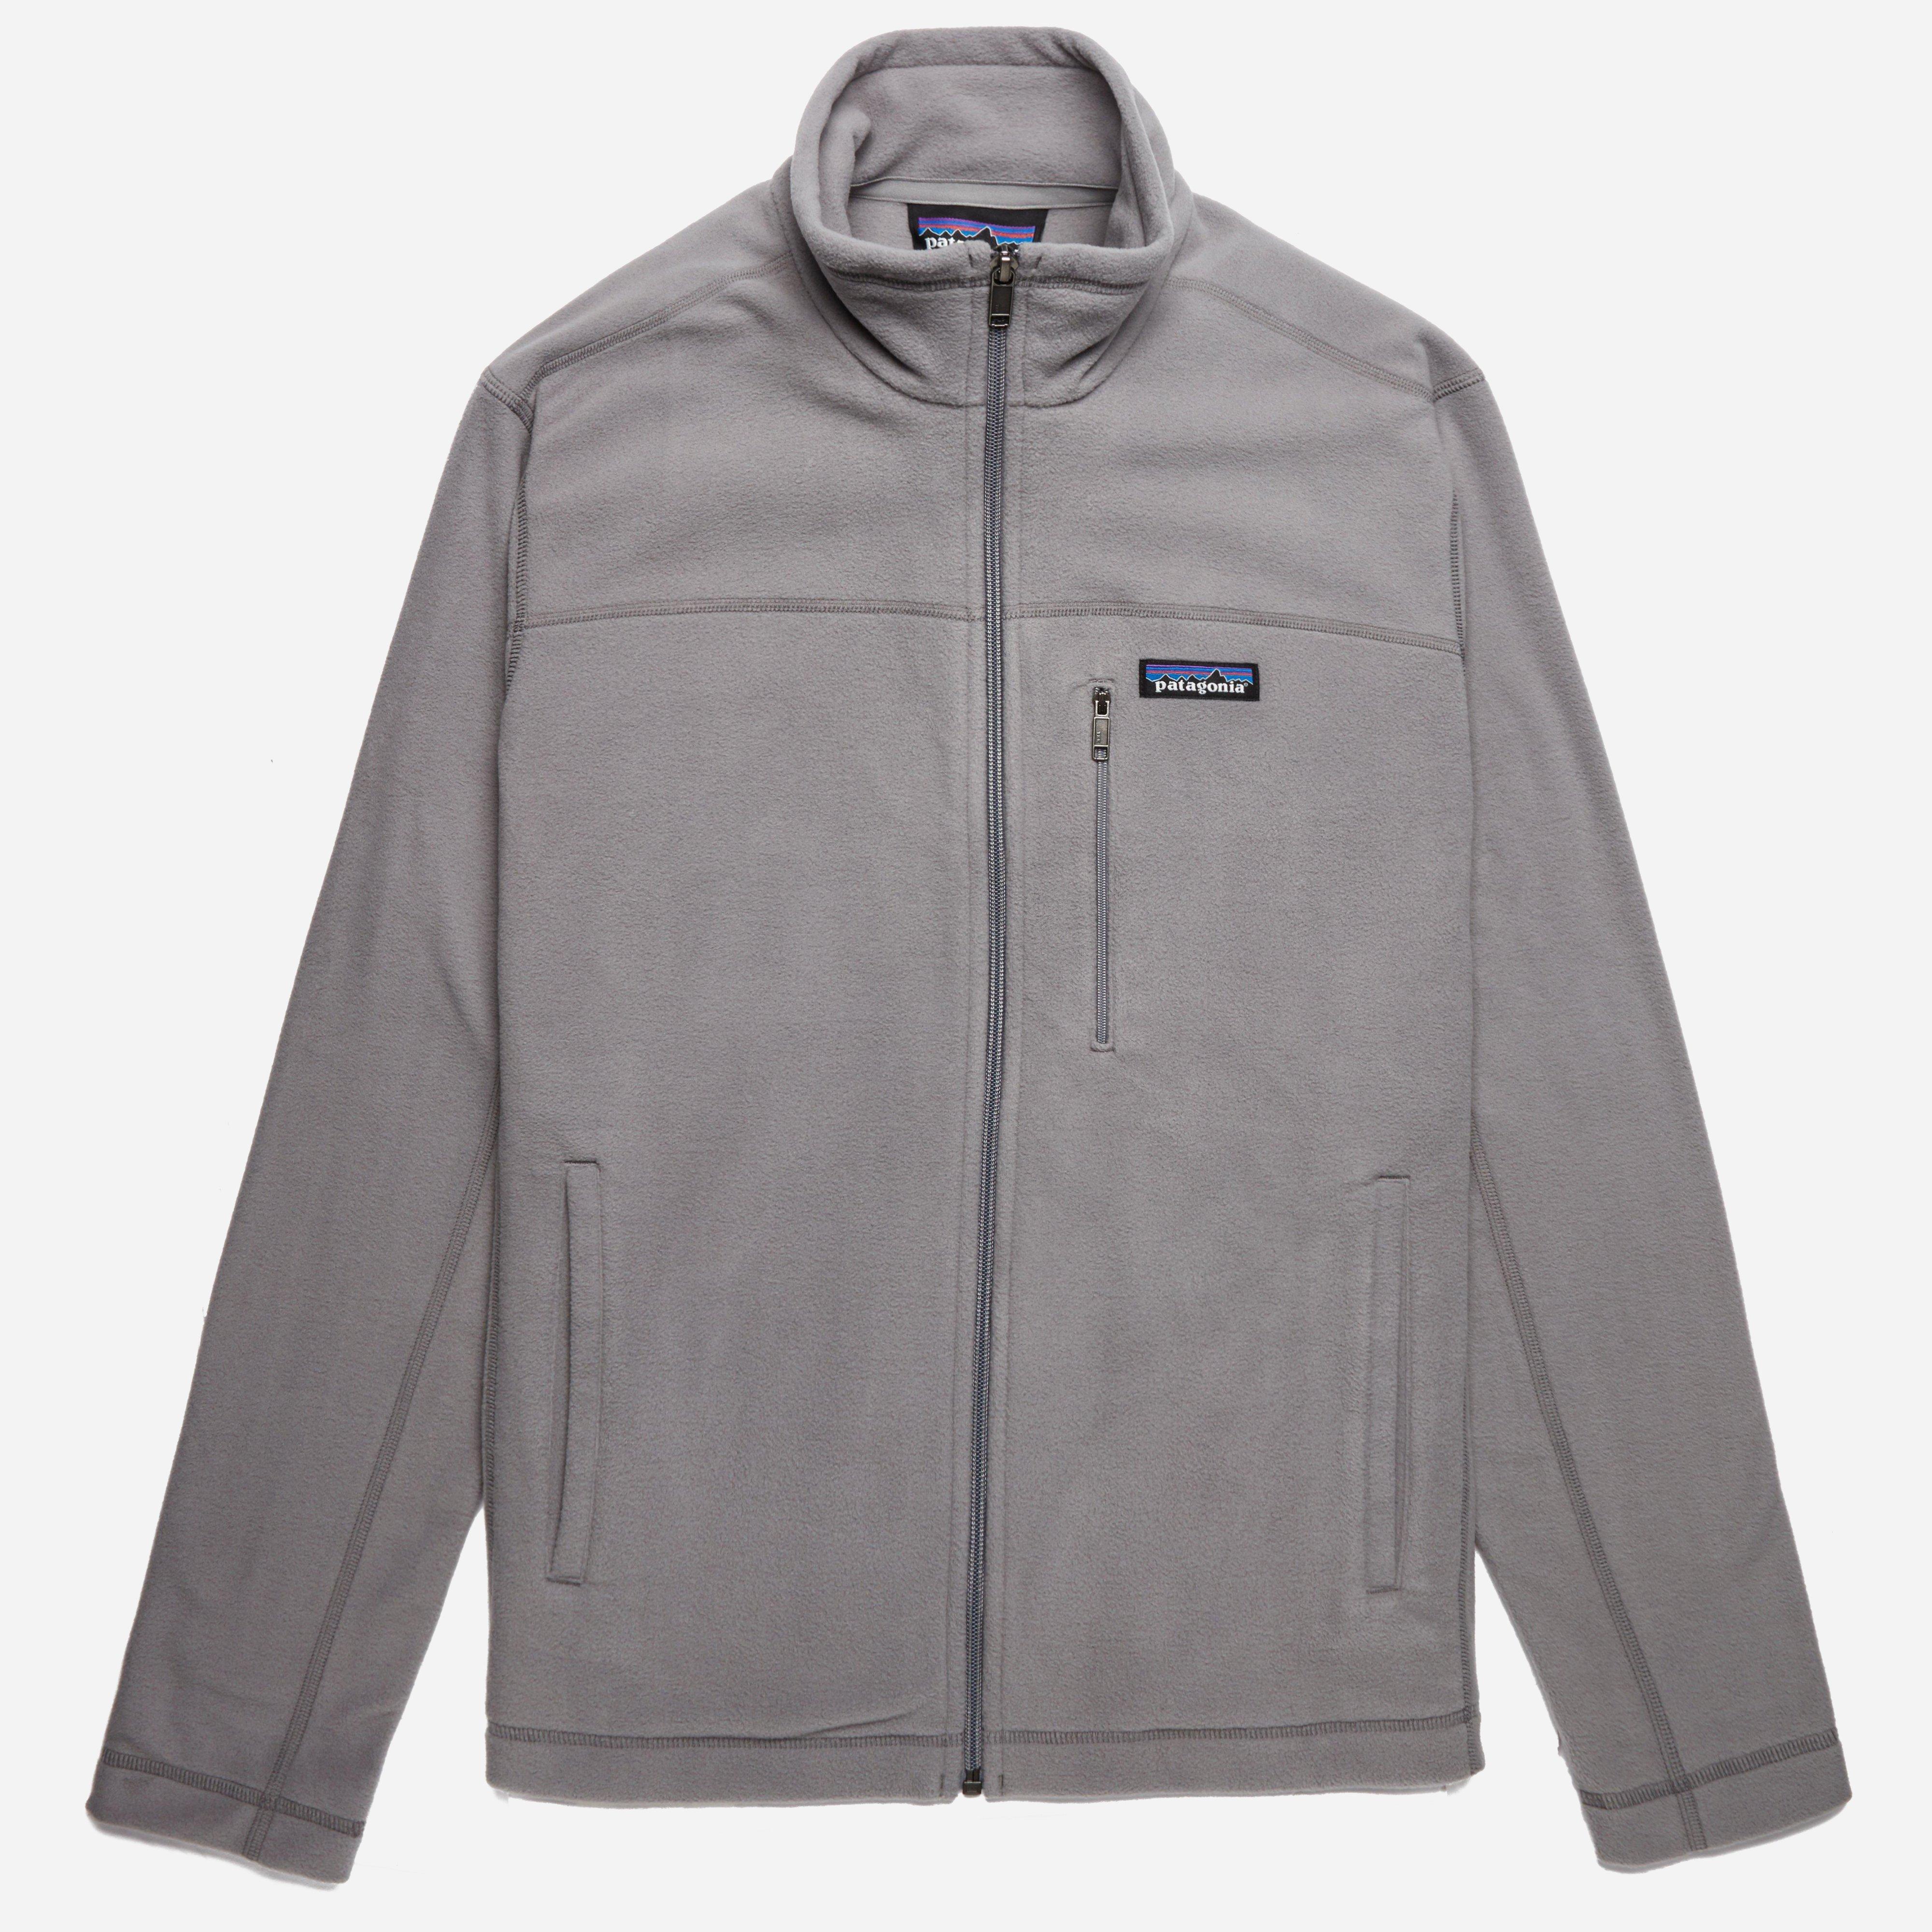 Patagonia M's Micro D Jacket